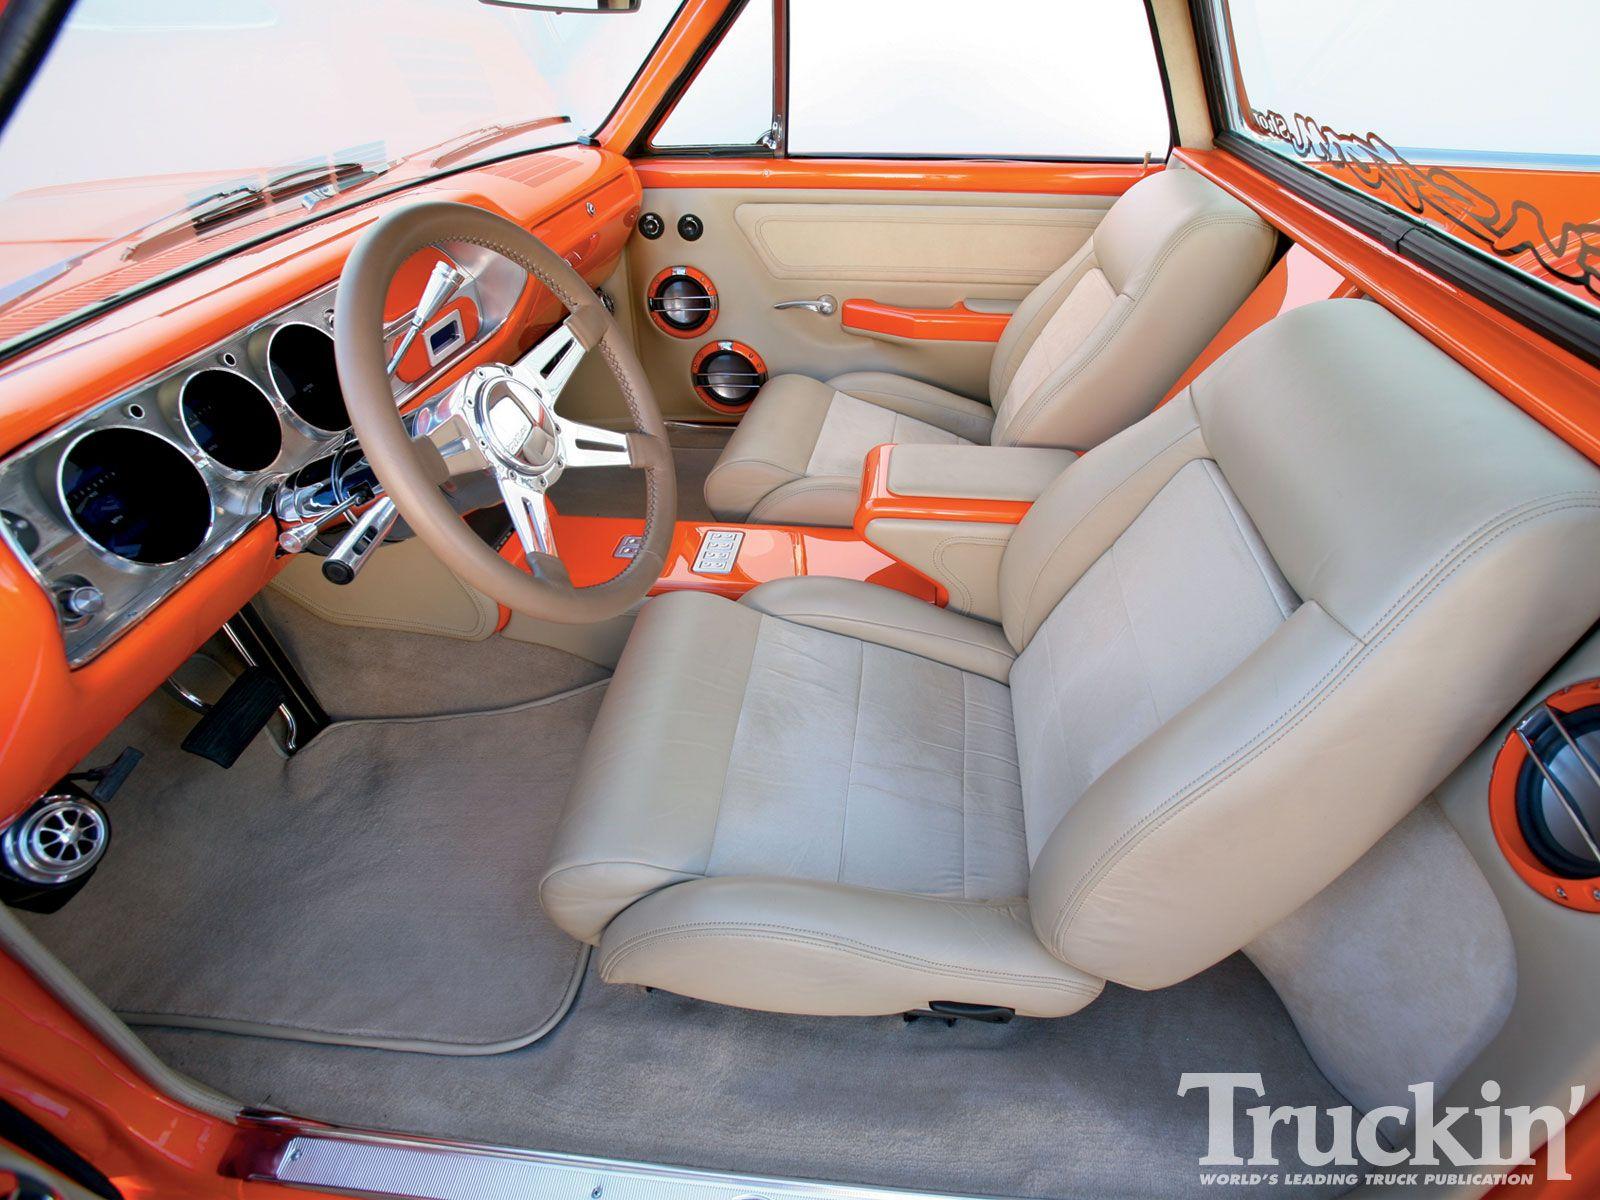 Car interior paint job - 1965 Chevy El Camino Interior Large